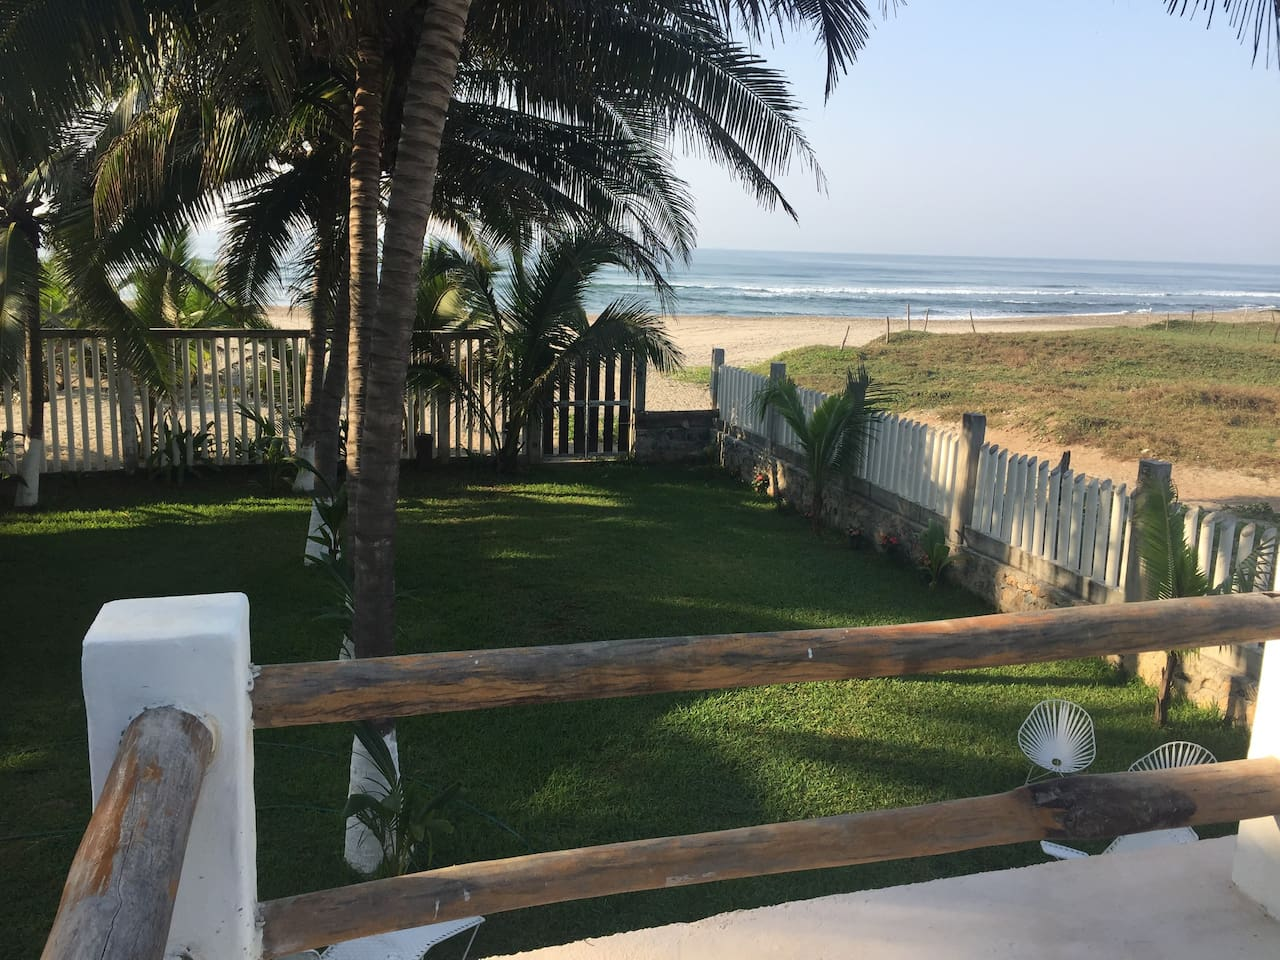 Tu hogar frente a la playa. Your home at the beach